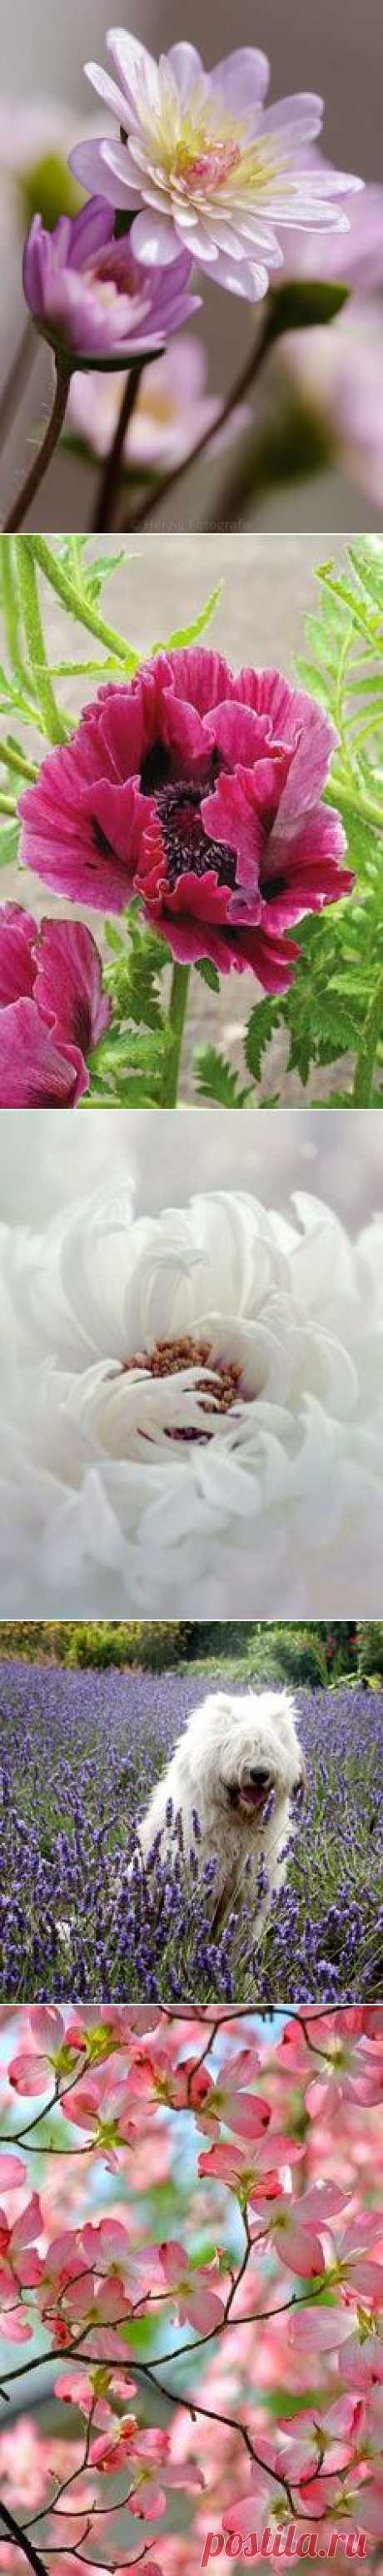 Flowers`•.¸¸.ஐ